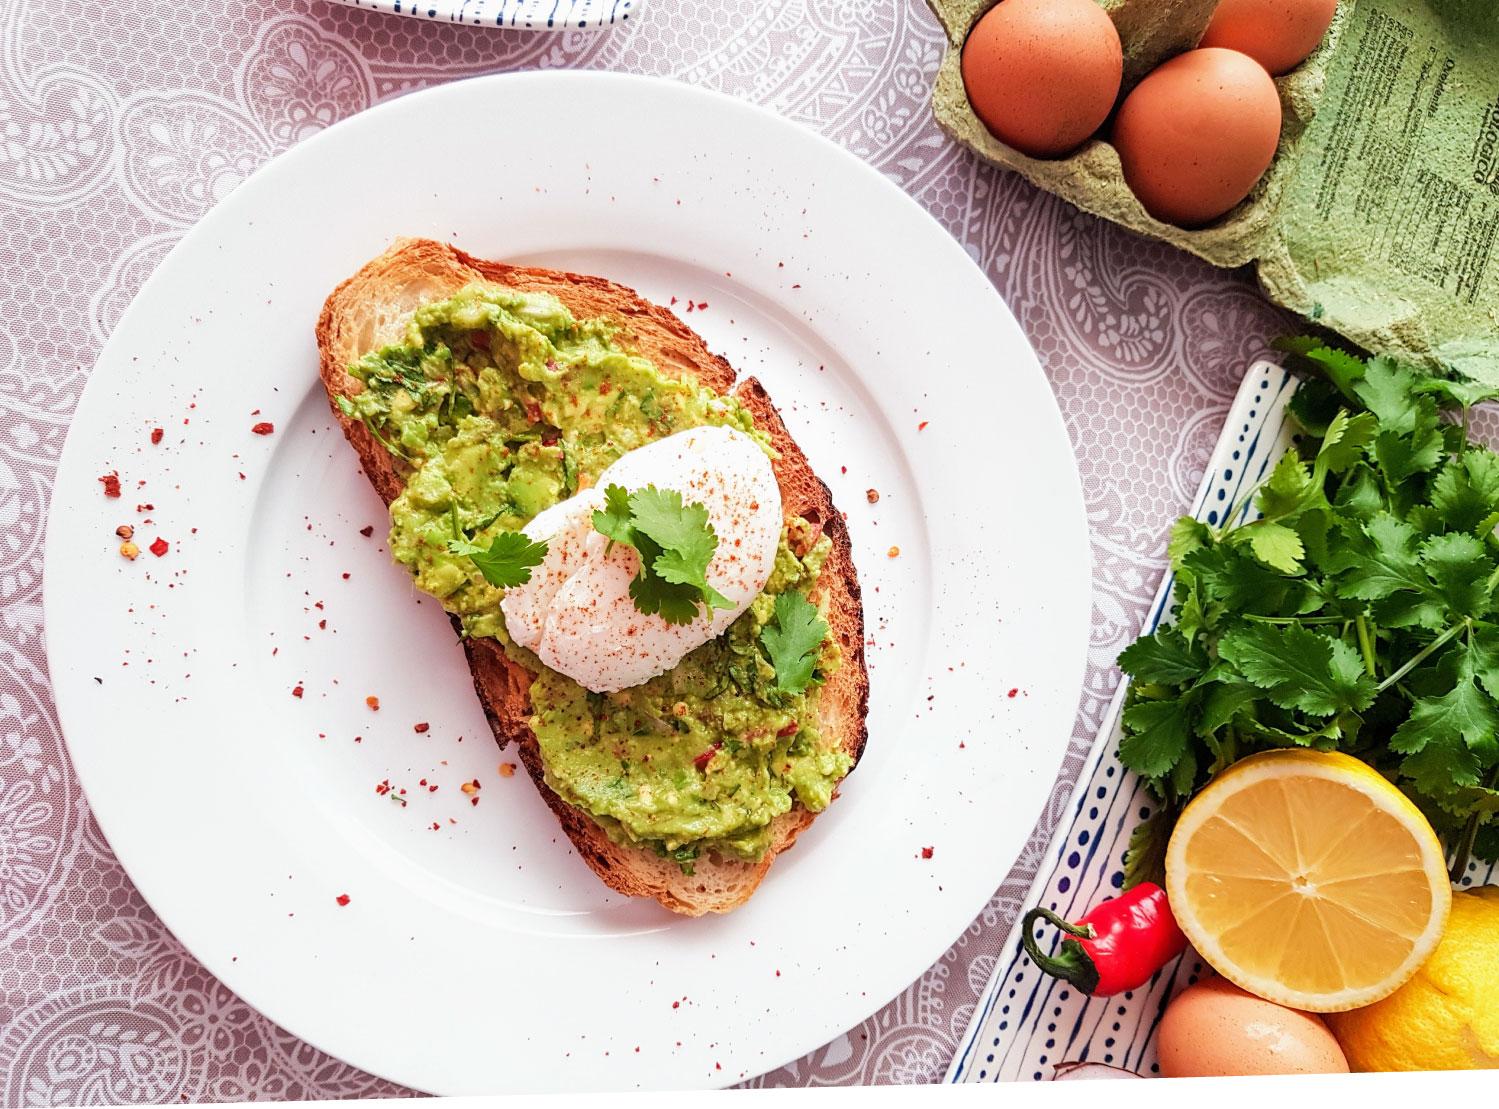 ann-sammut-avocado-toast